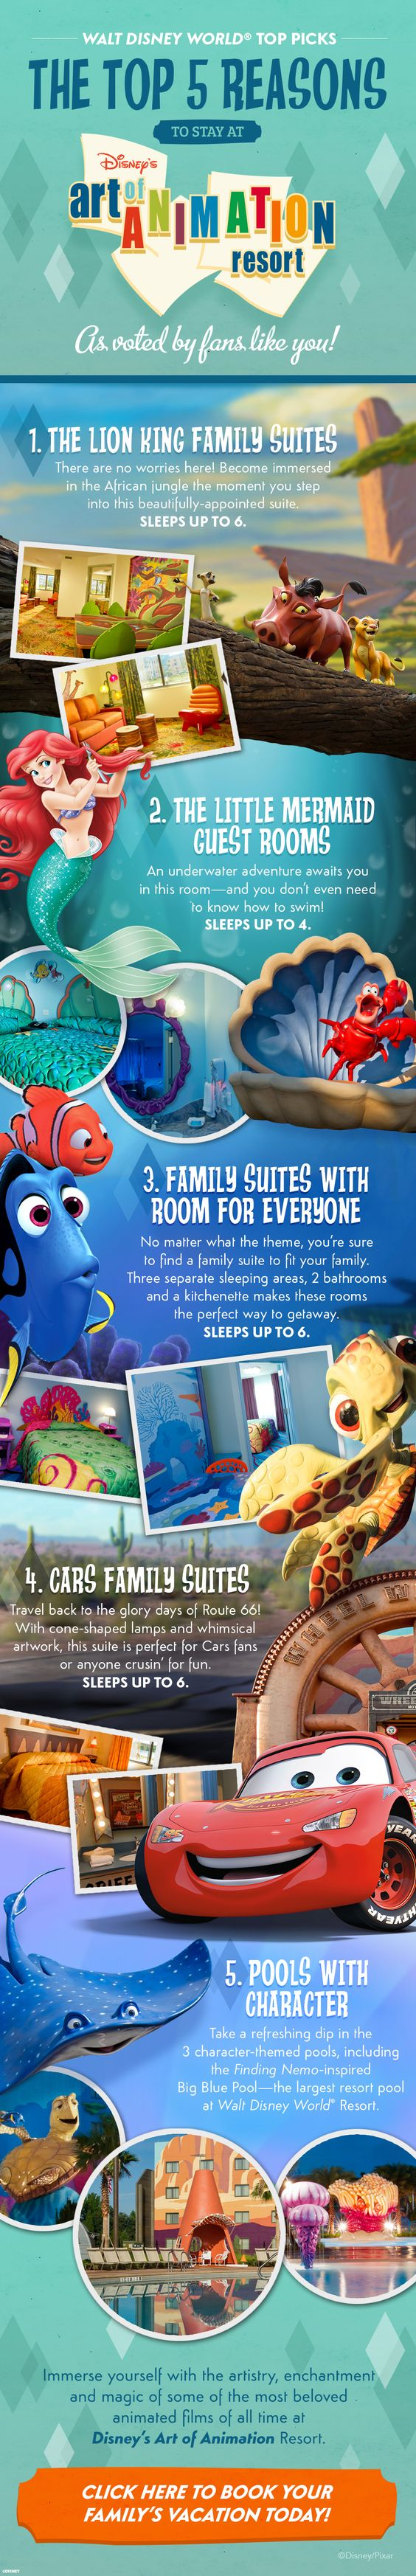 Disney World Resorts | Top 5 Reasons to stay at Disney's Art of Animation Resort!